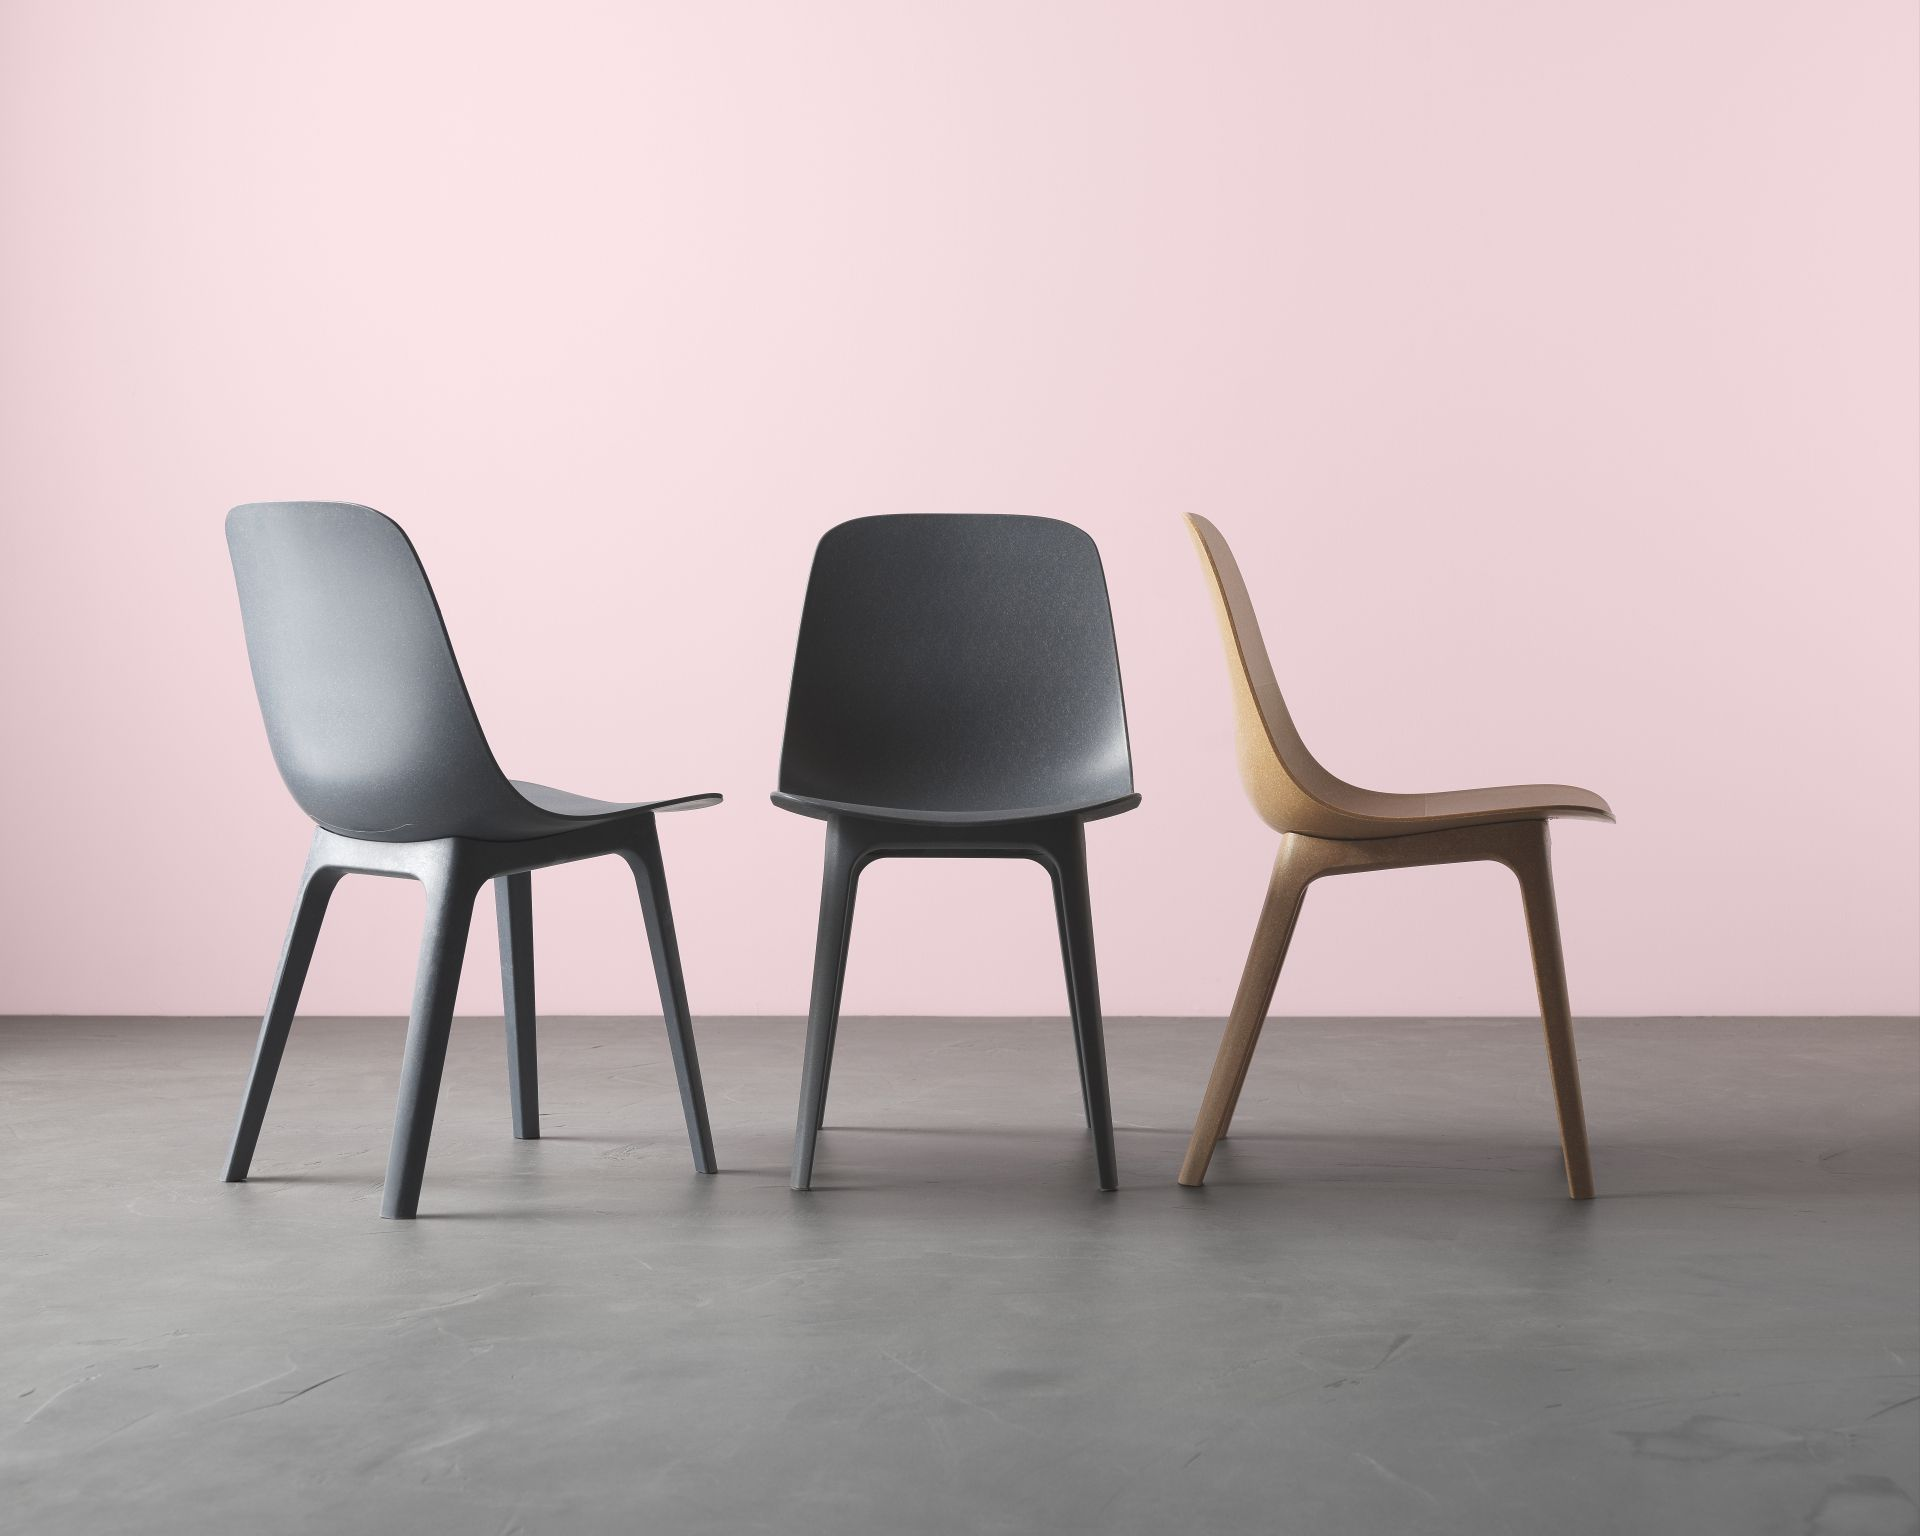 Ikea stoel wit hout bureaustoelen ikea eetkamer ikea